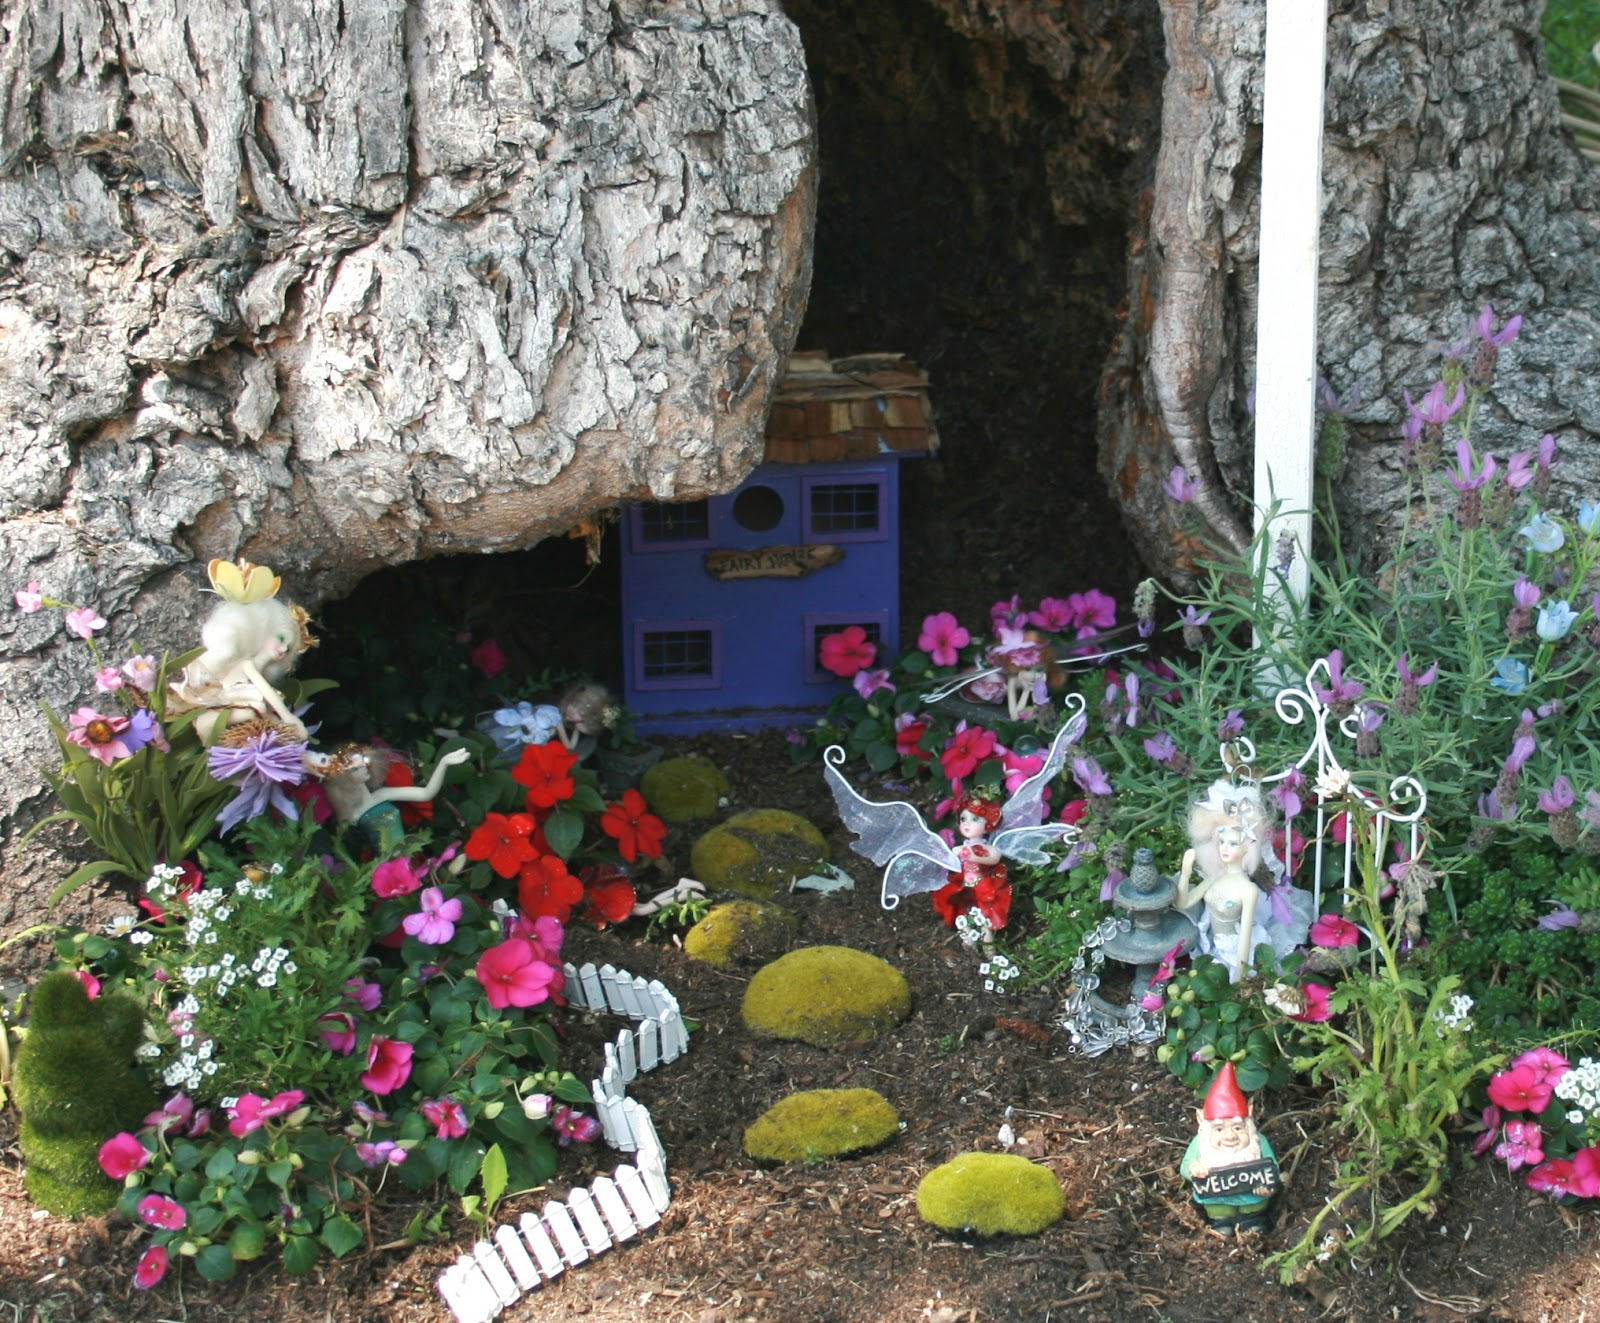 ciao! newport beach: the old-town tustin home & garden tour